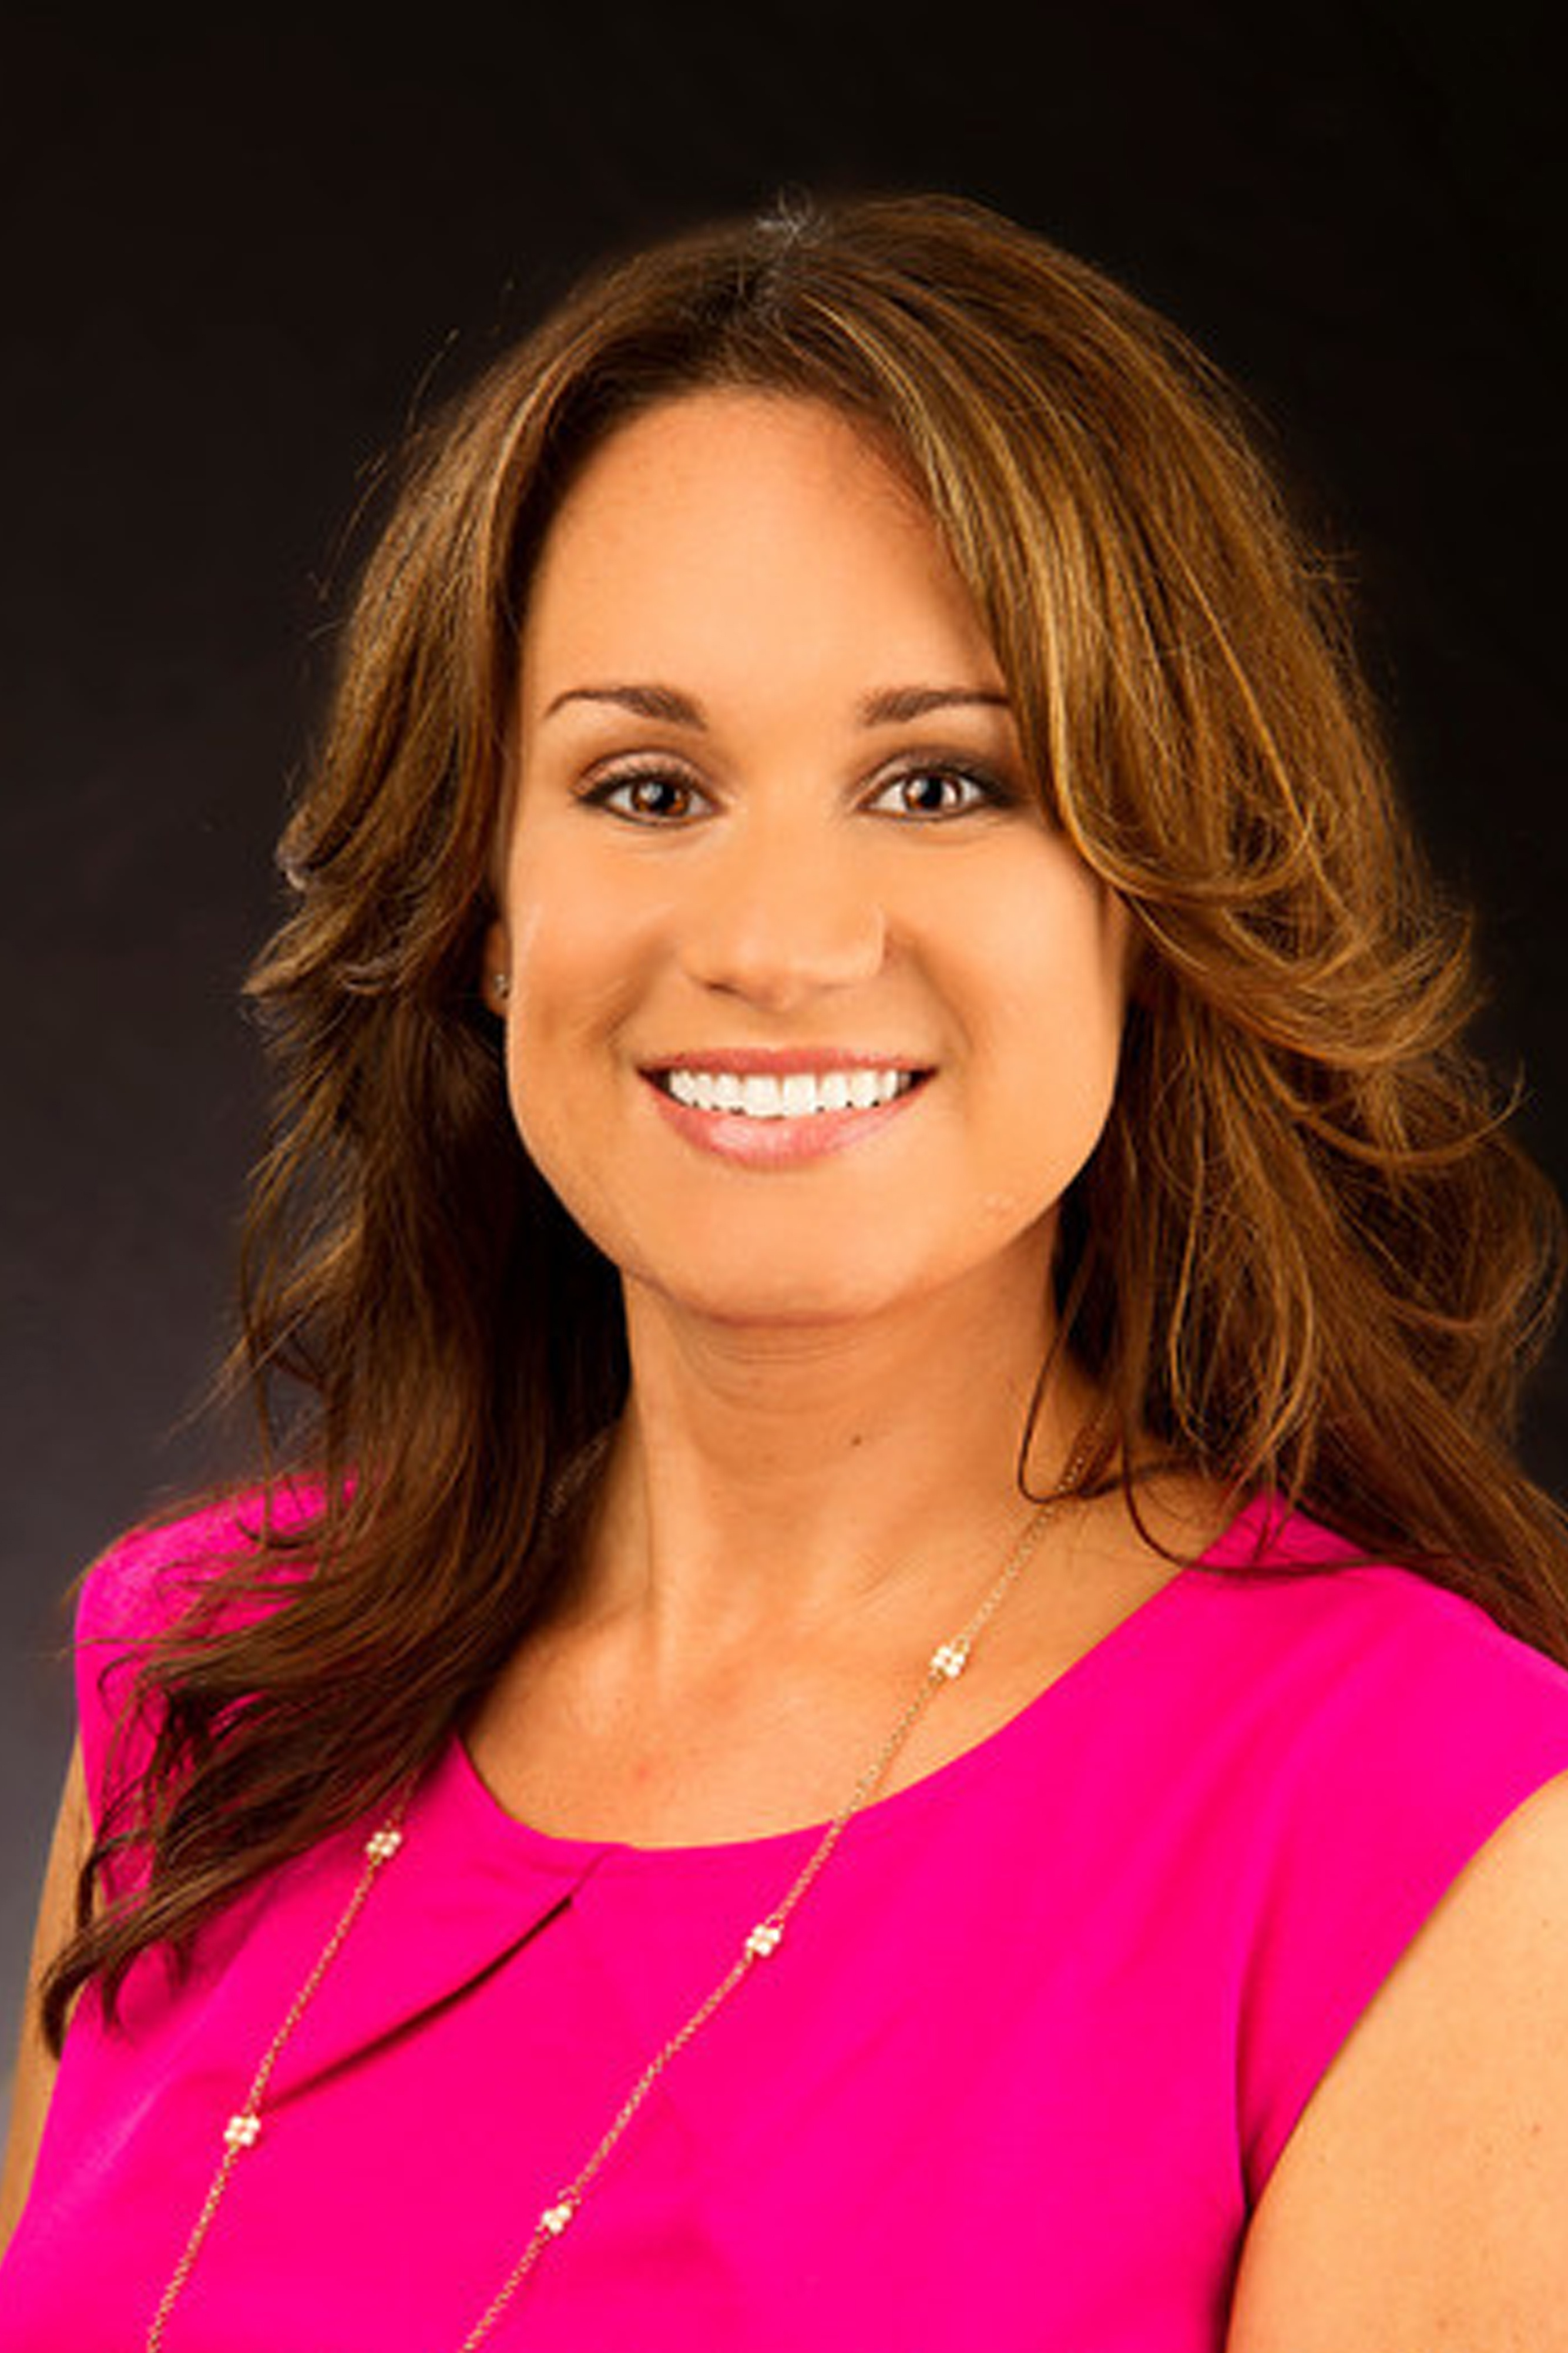 Amanda Simmons